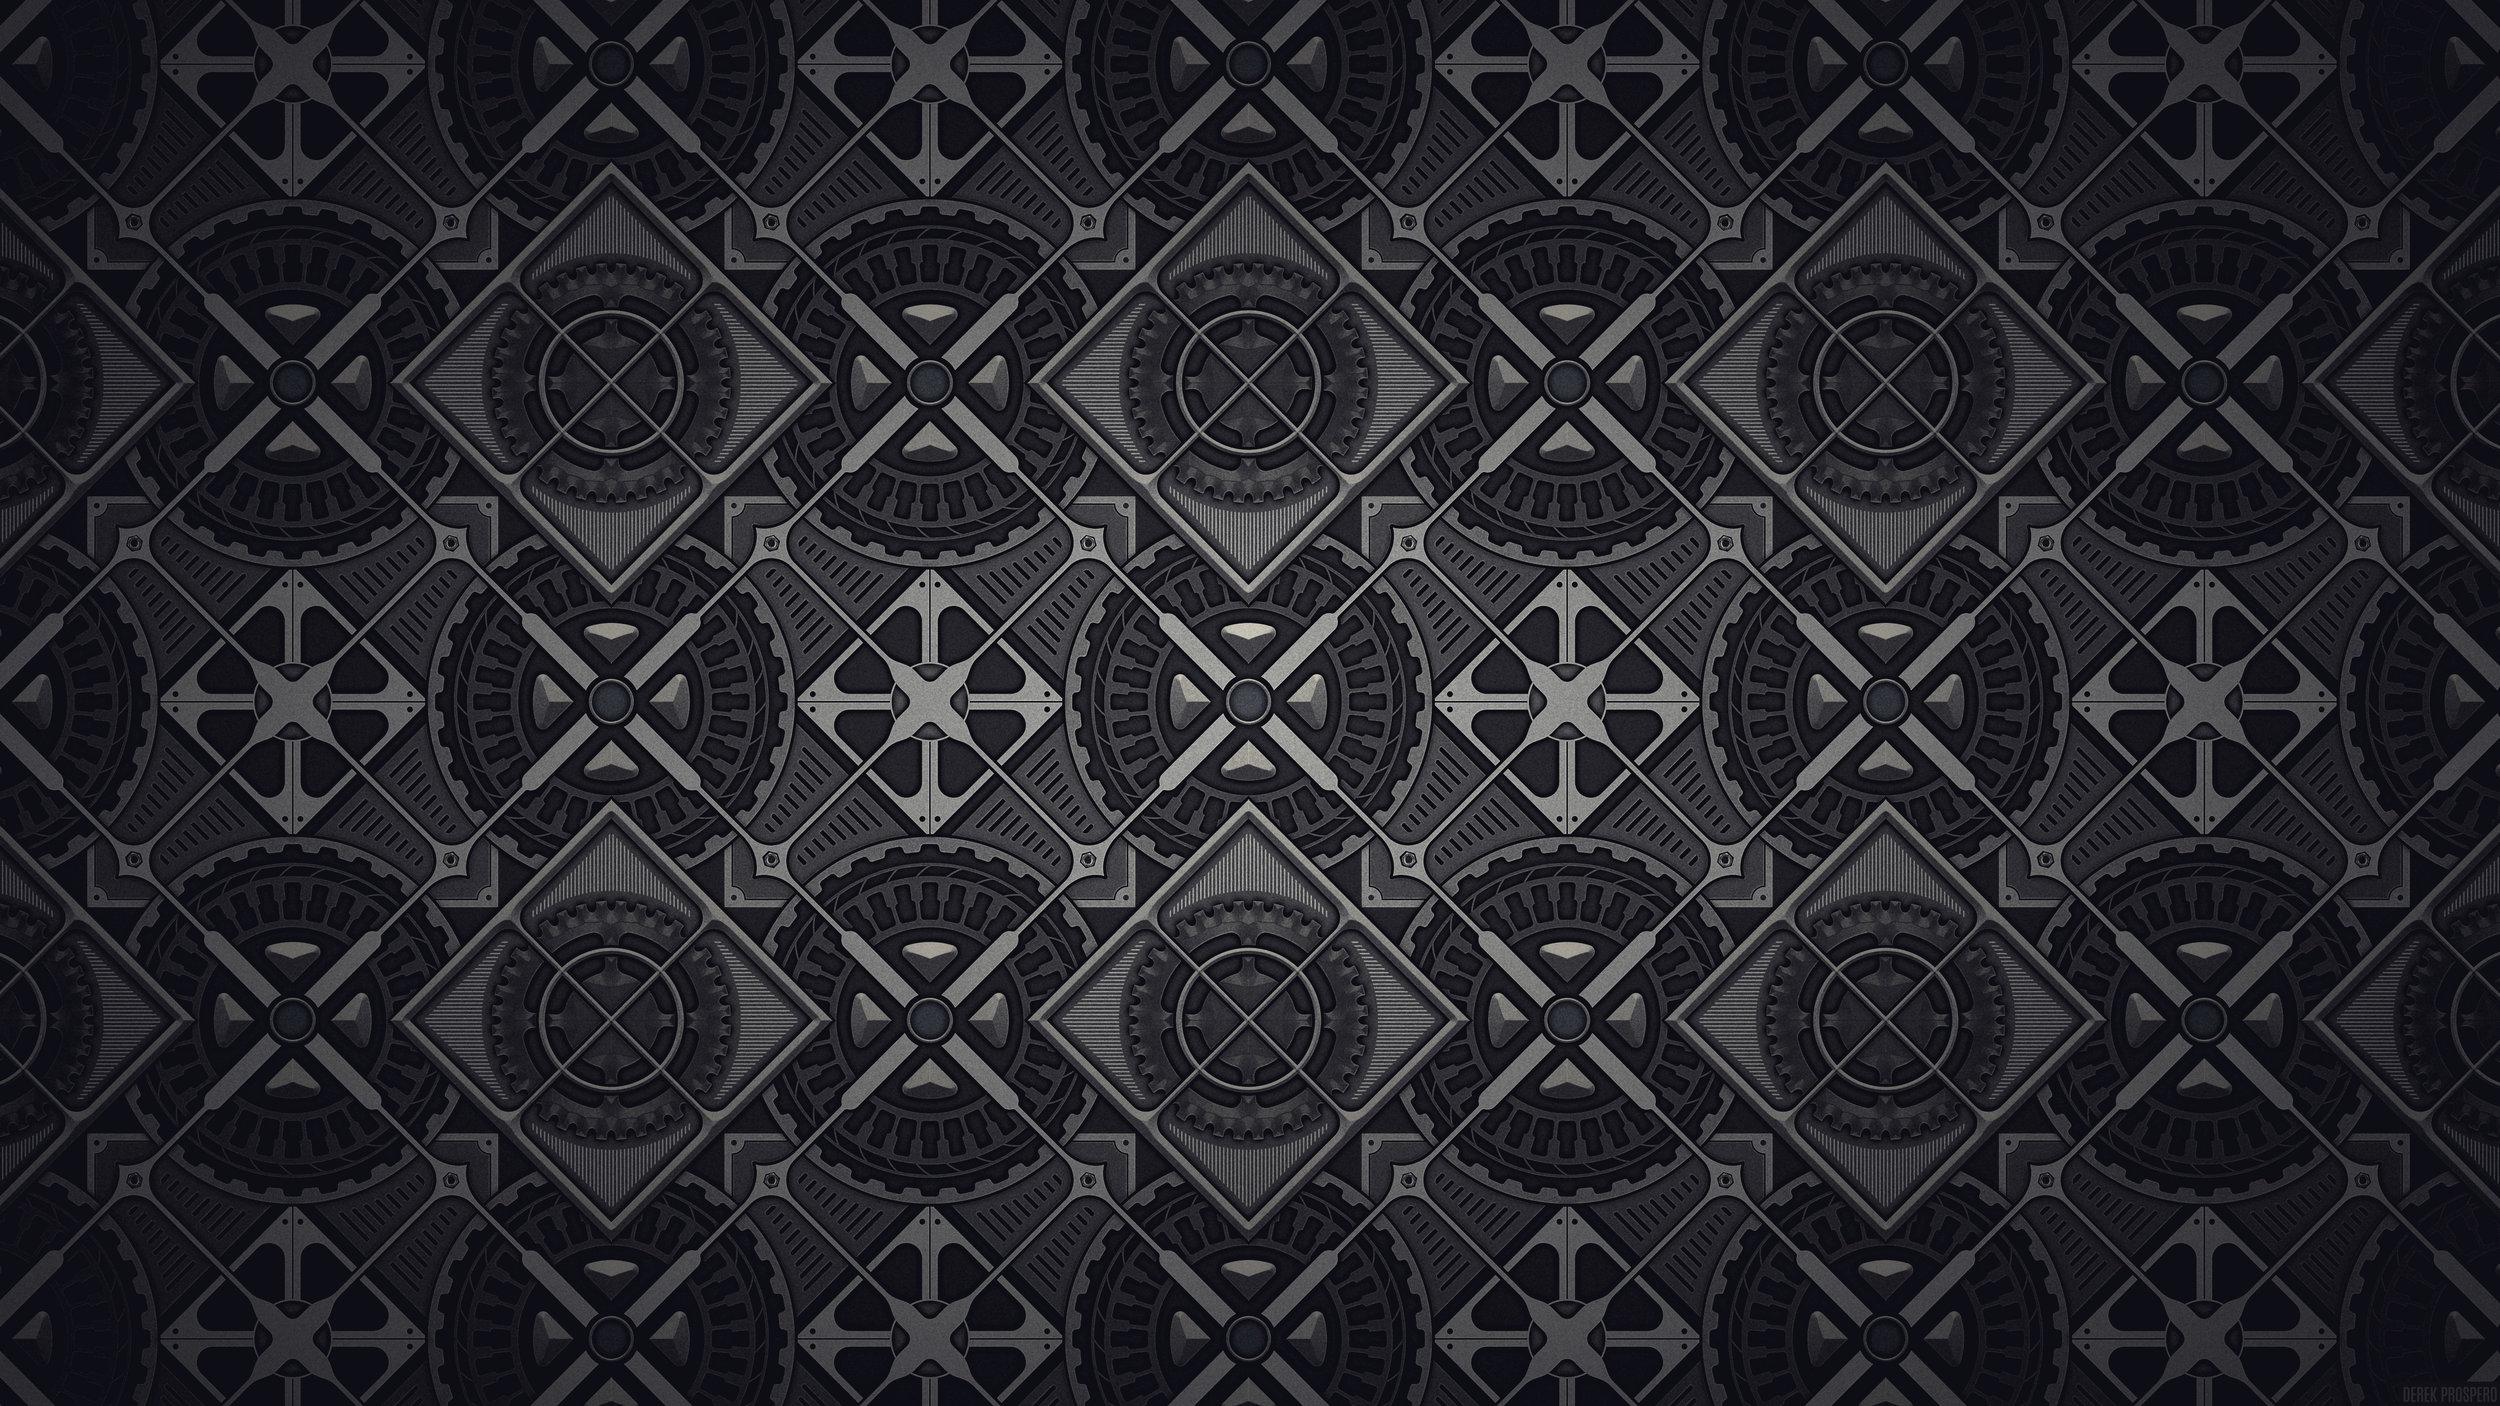 pattern-006.jpg